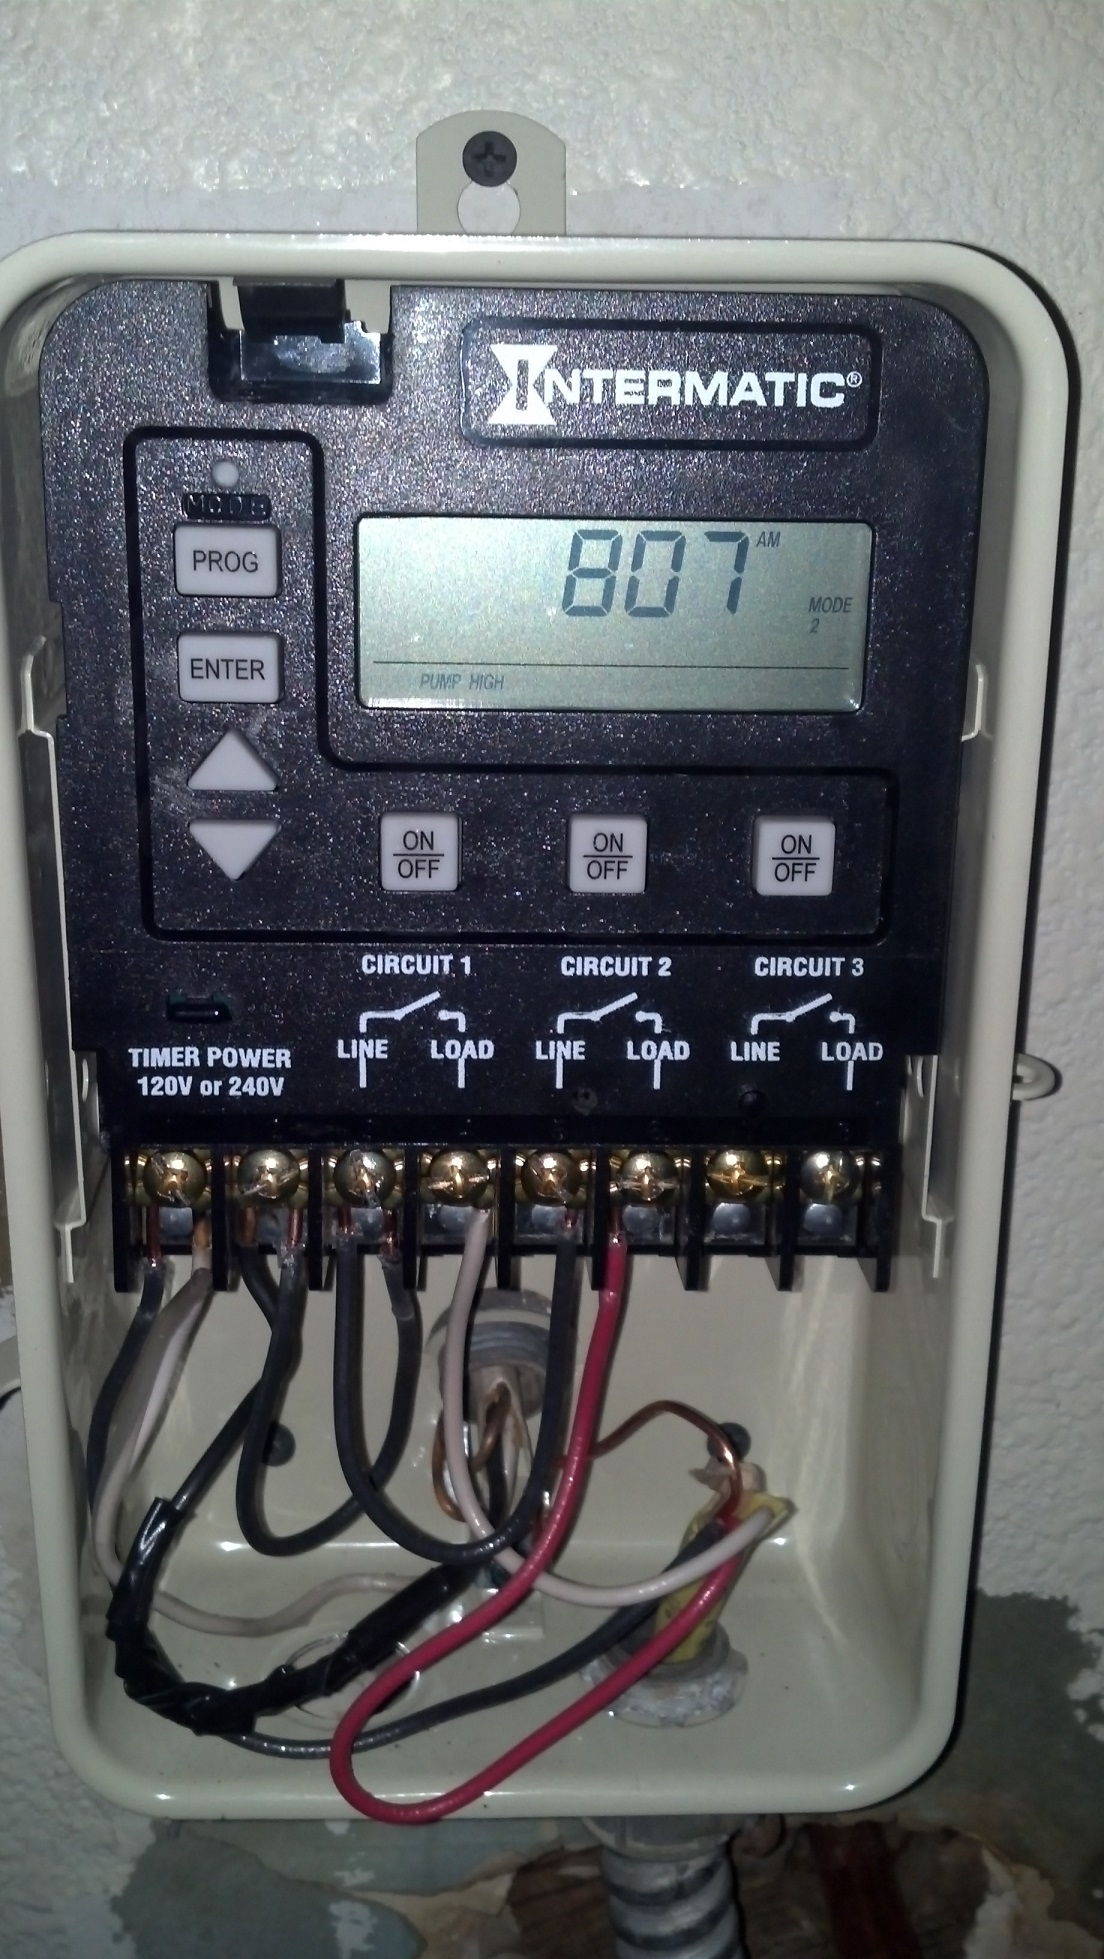 Spdt Intermatic T106m Wiring Diagram Schematic Diagrams T102 Pool Pump Switch